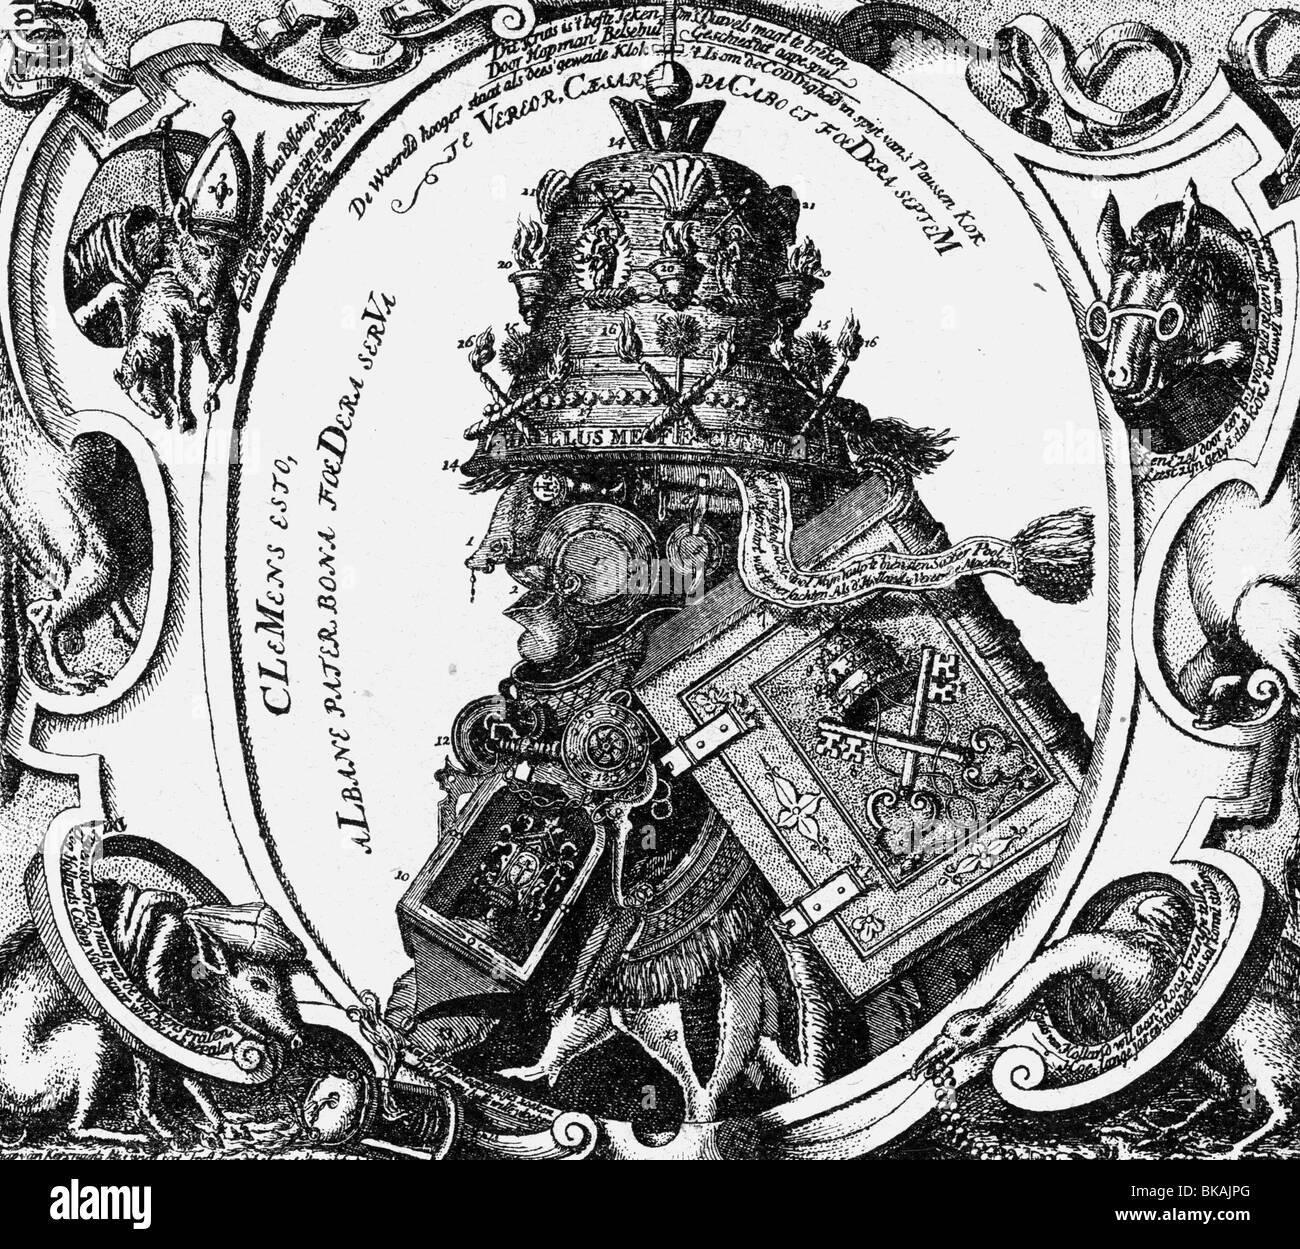 Events protestant reformation 1517 1555 propaganda dutch events protestant reformation 1517 1555 propaganda dutch caricature on medieval papacy 16th century historic historical buycottarizona